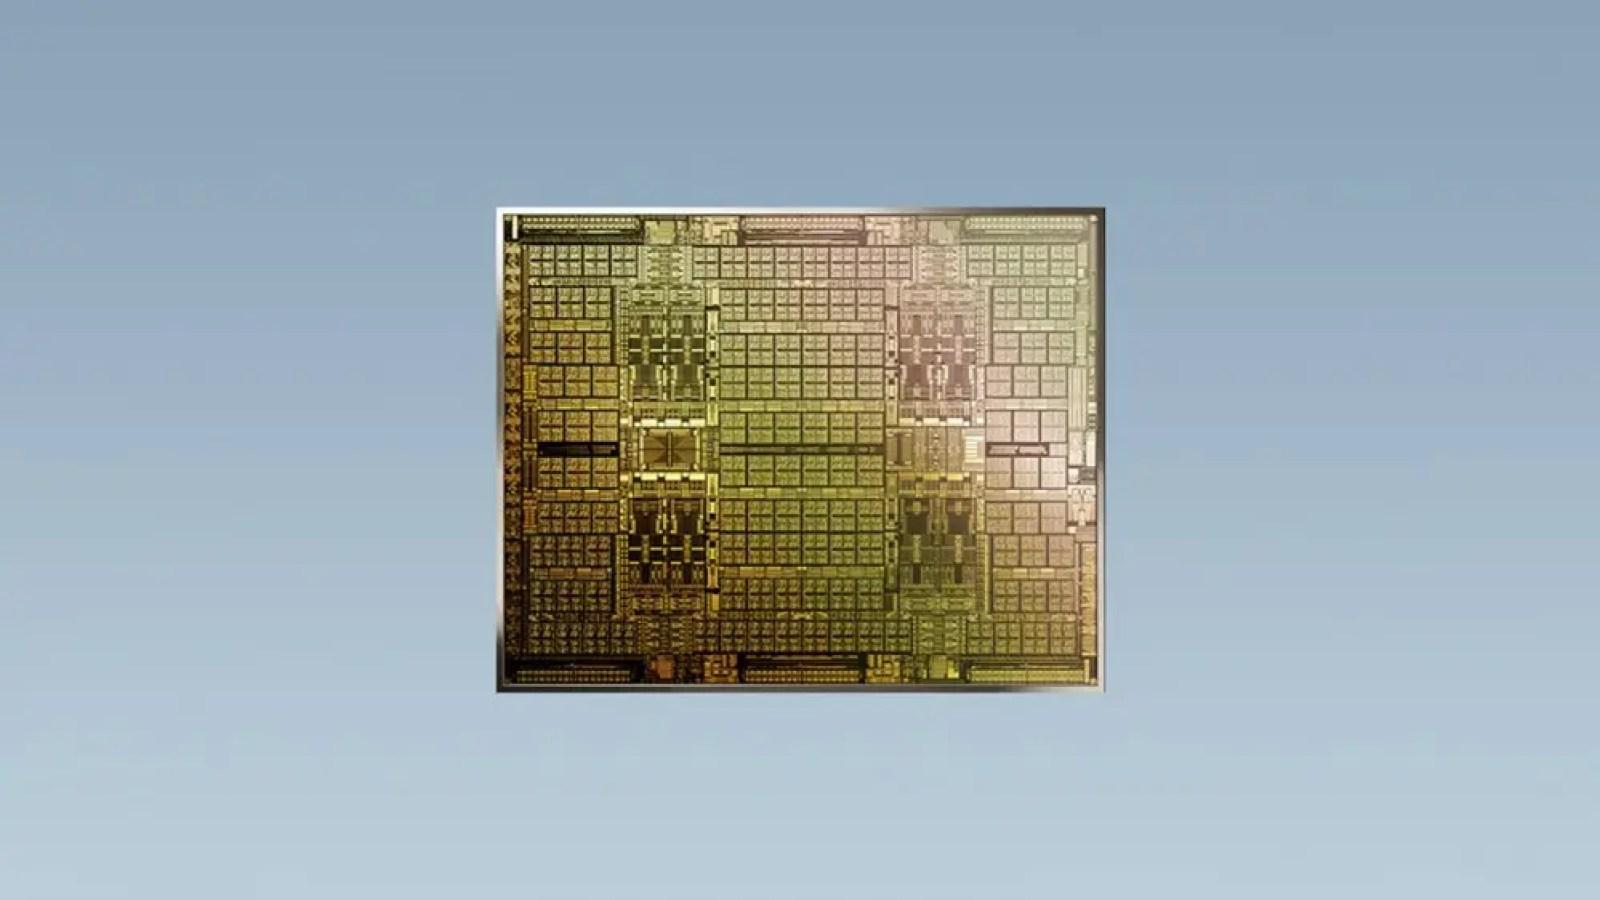 A CMP chip against a blue background.